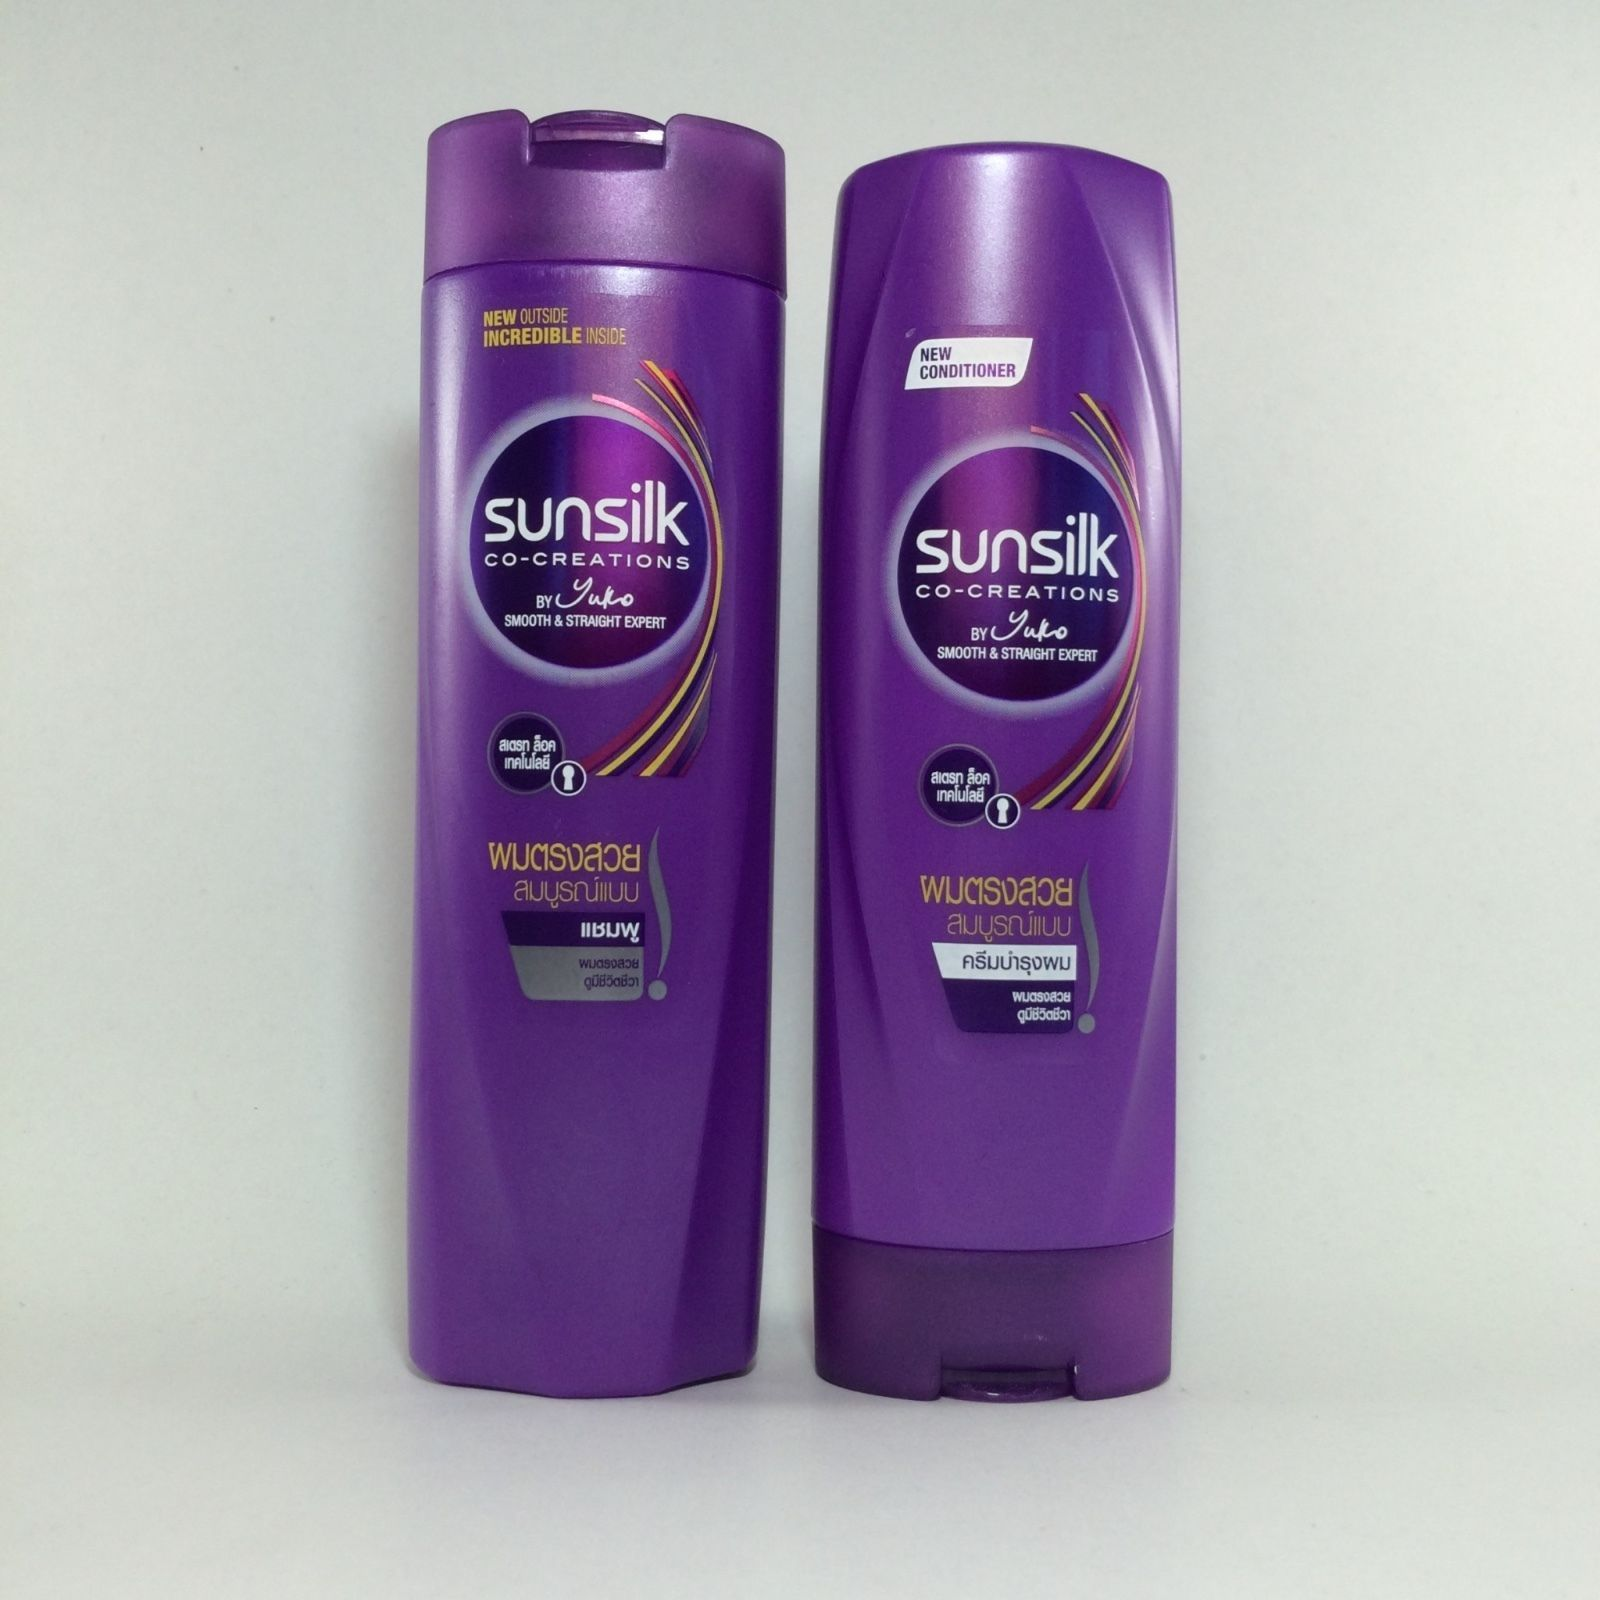 Sunsilk] Co Creations Perfect Straight Nourishing Hair Shampoo